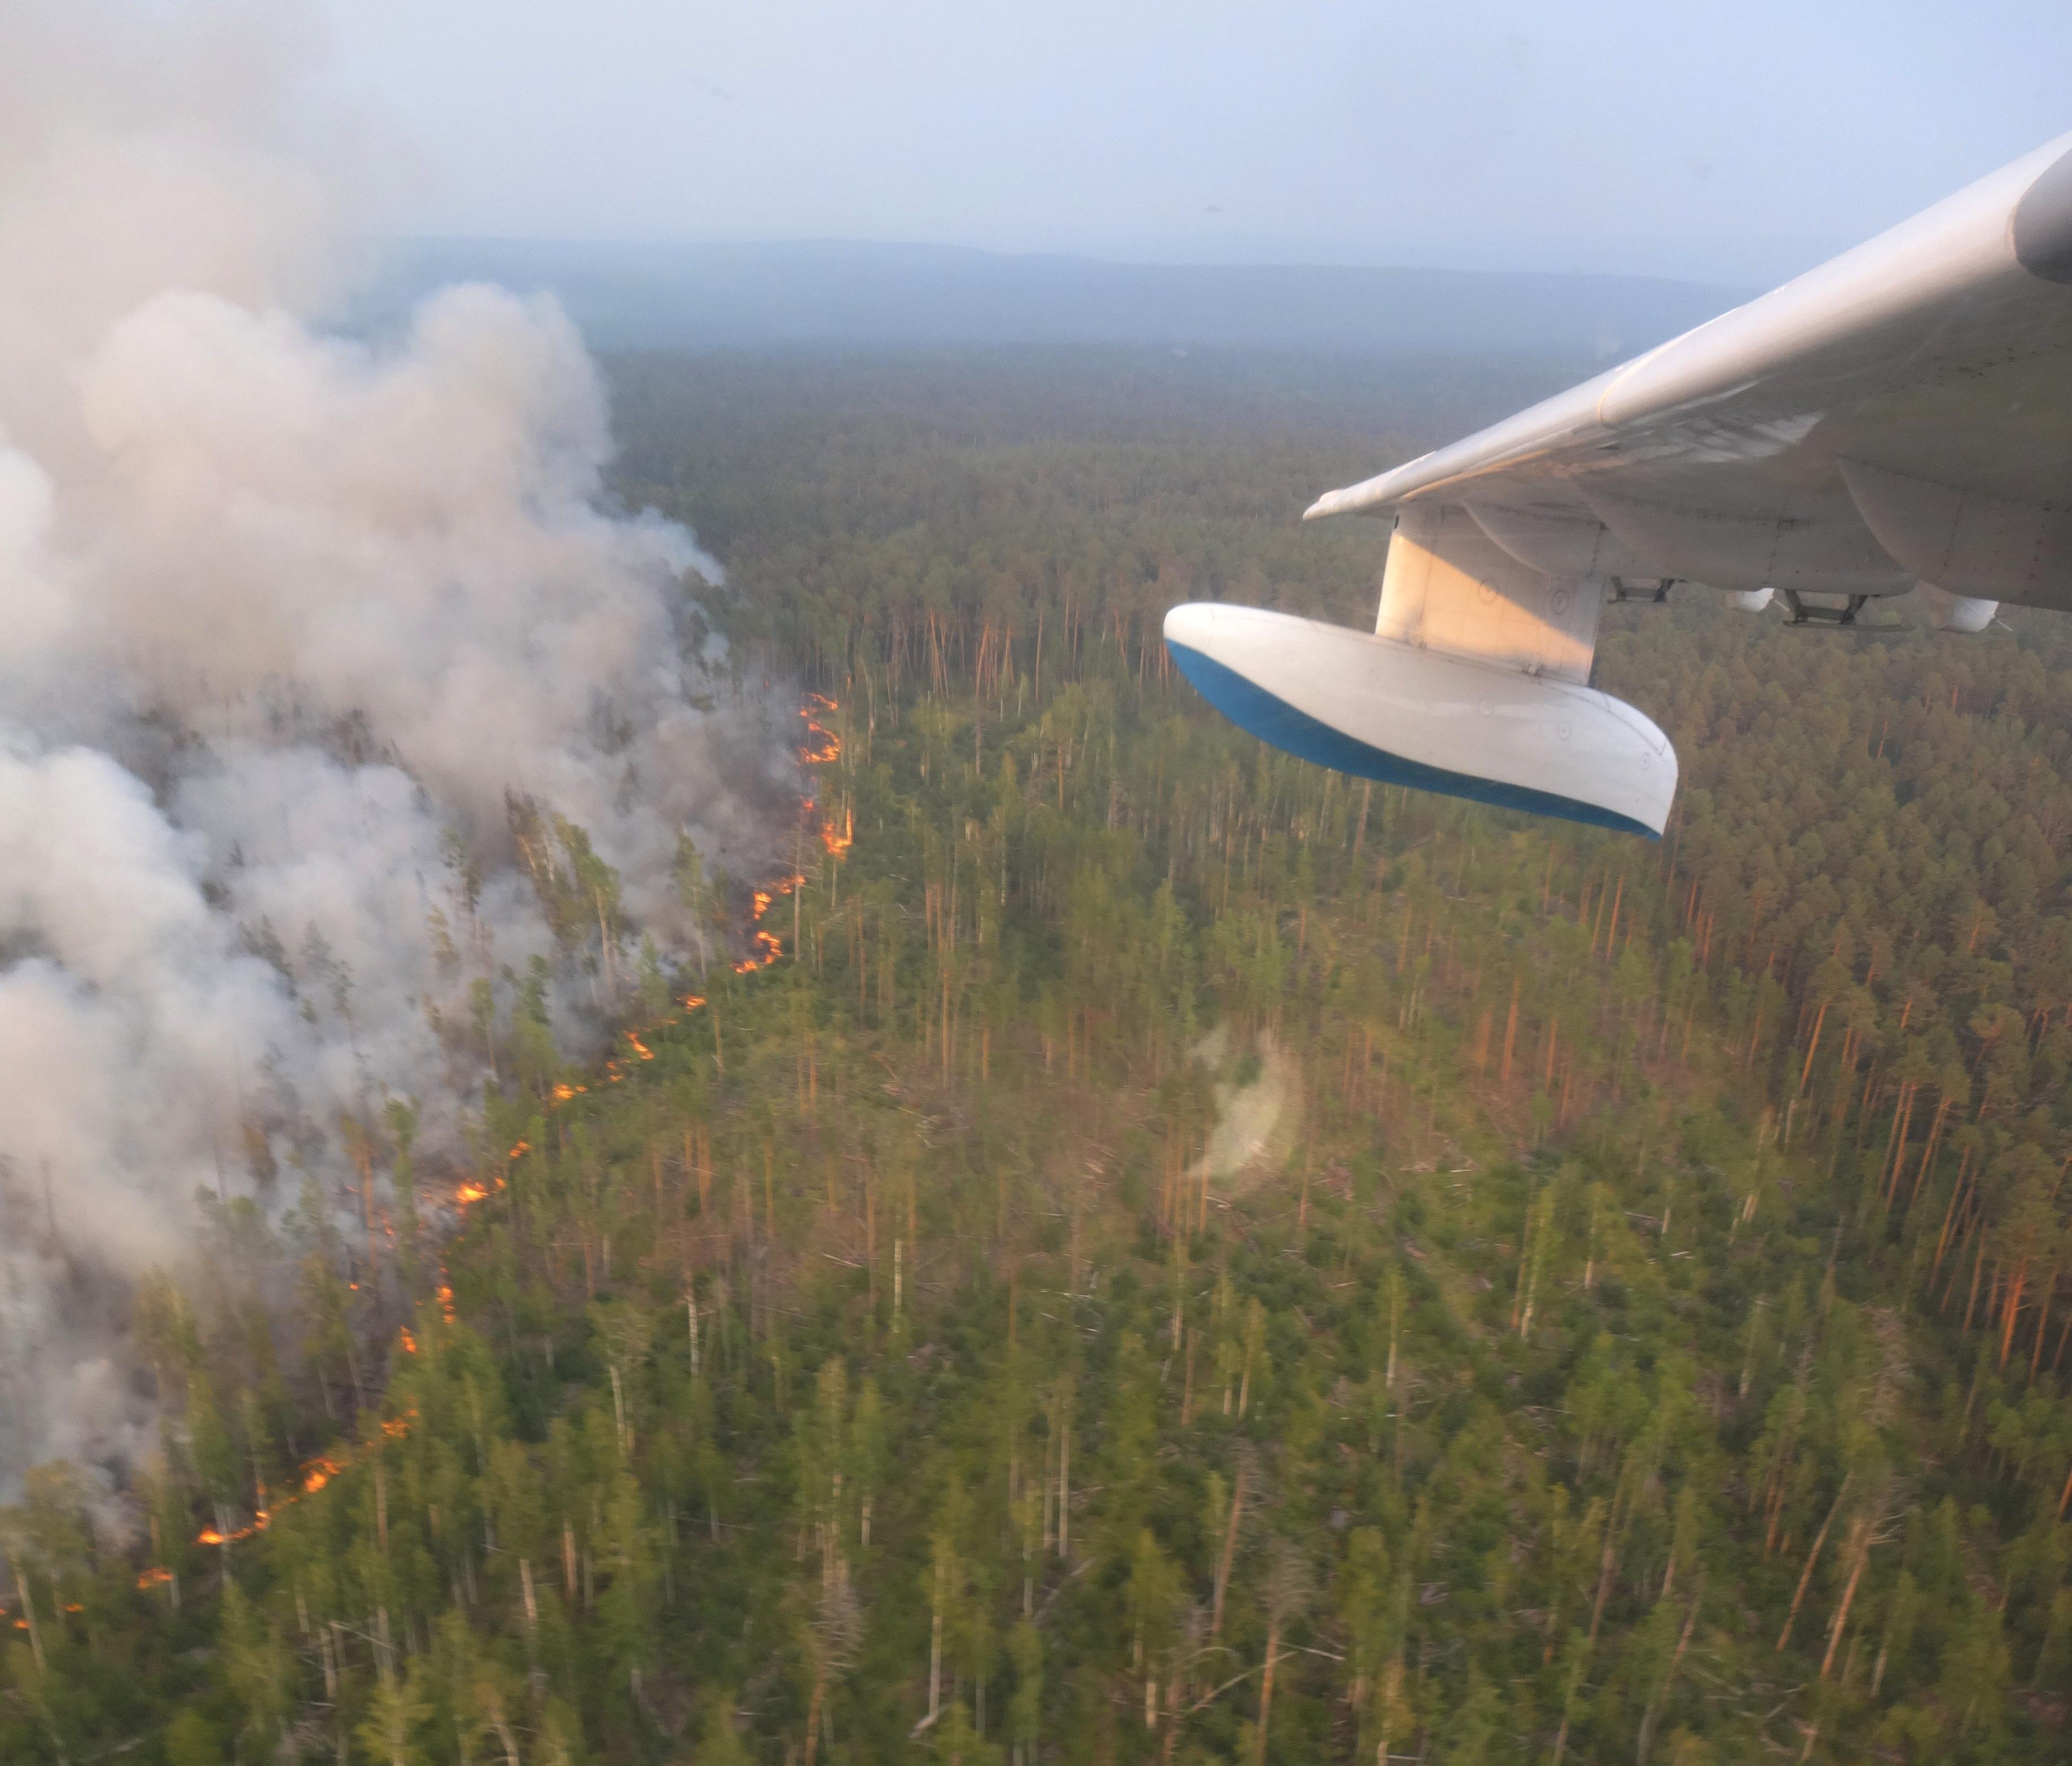 Trump offers Putin help with Siberian wildfires: Kremlin